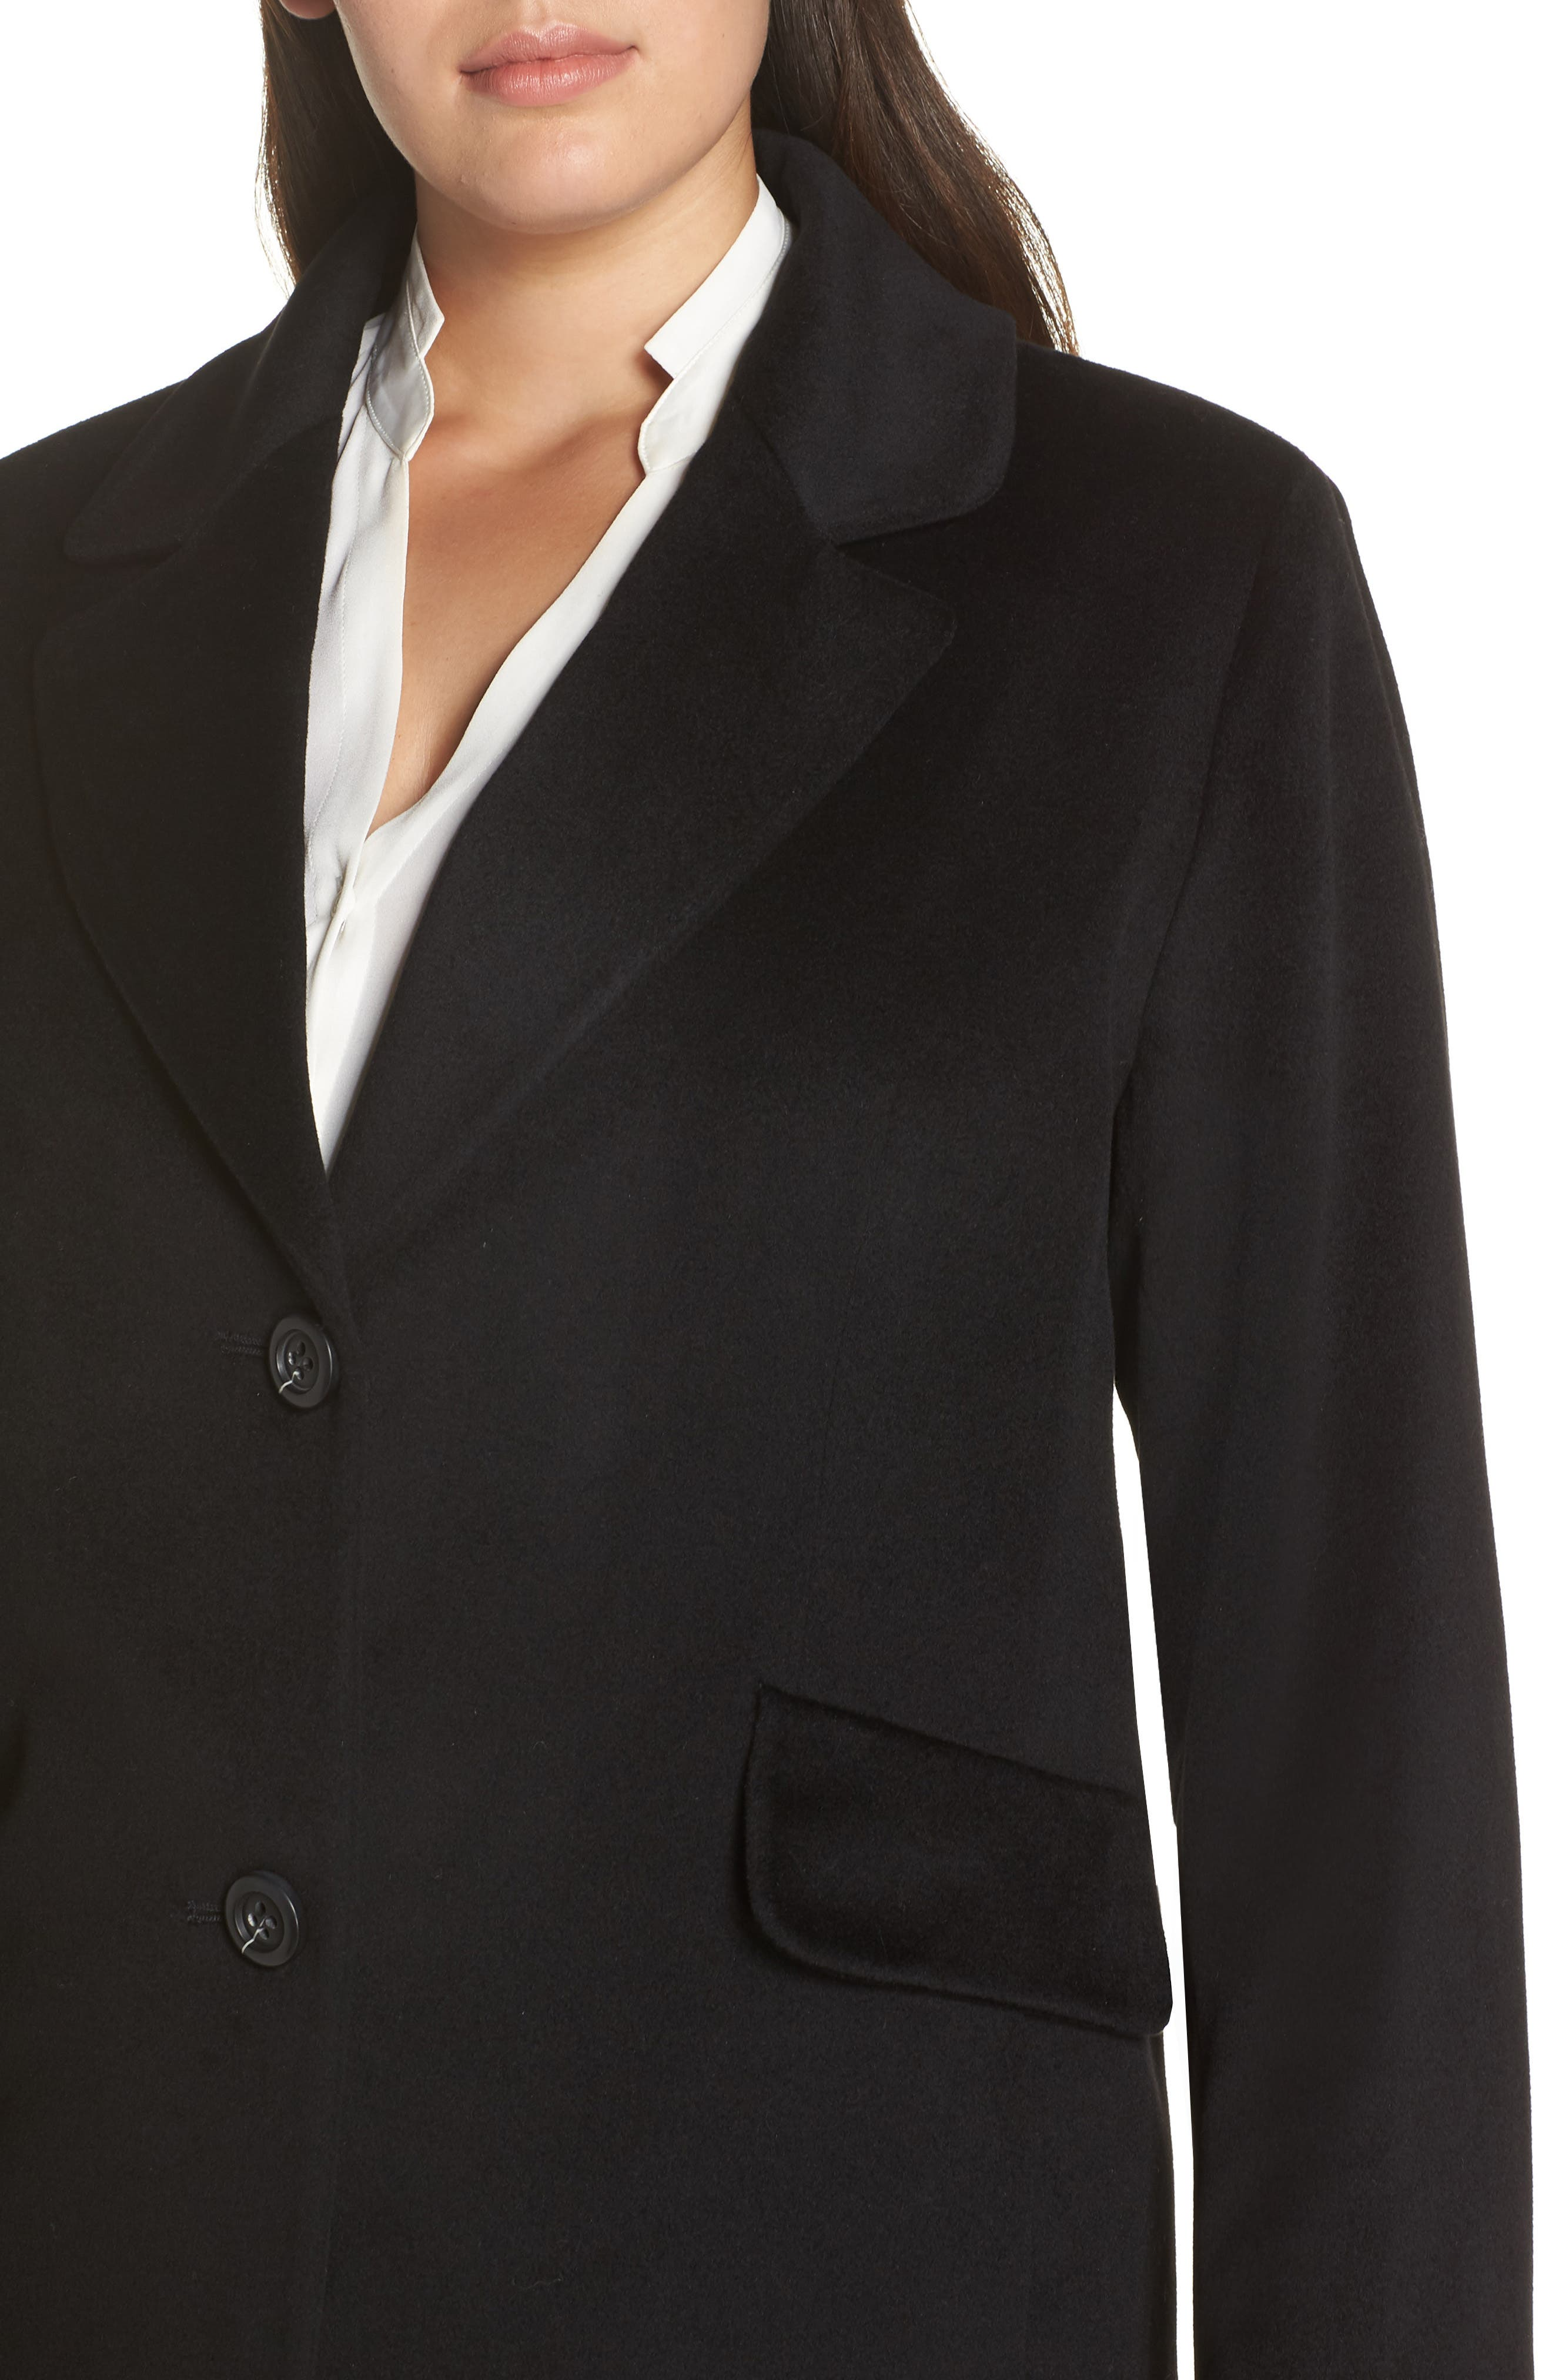 FLEURETTE,                             Notch Collar Loro Piana Wool Coat,                             Alternate thumbnail 4, color,                             BLACK